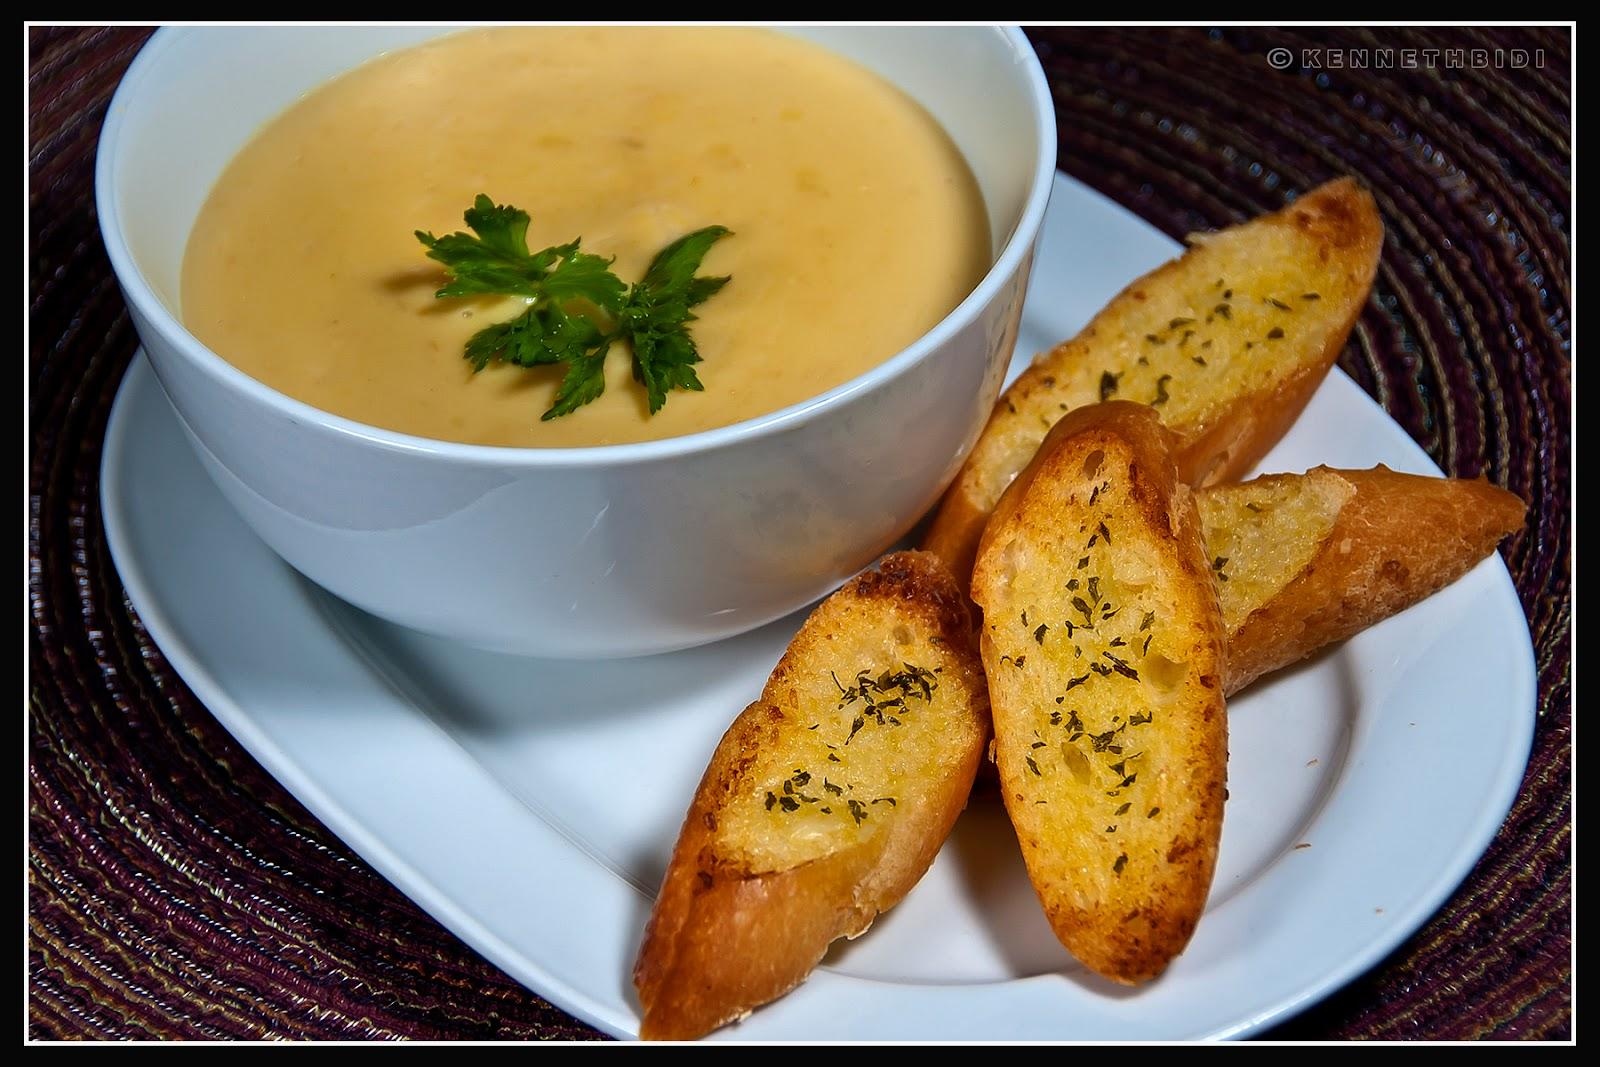 Cream of Chicken Mushroom Soup with Garlic Bread